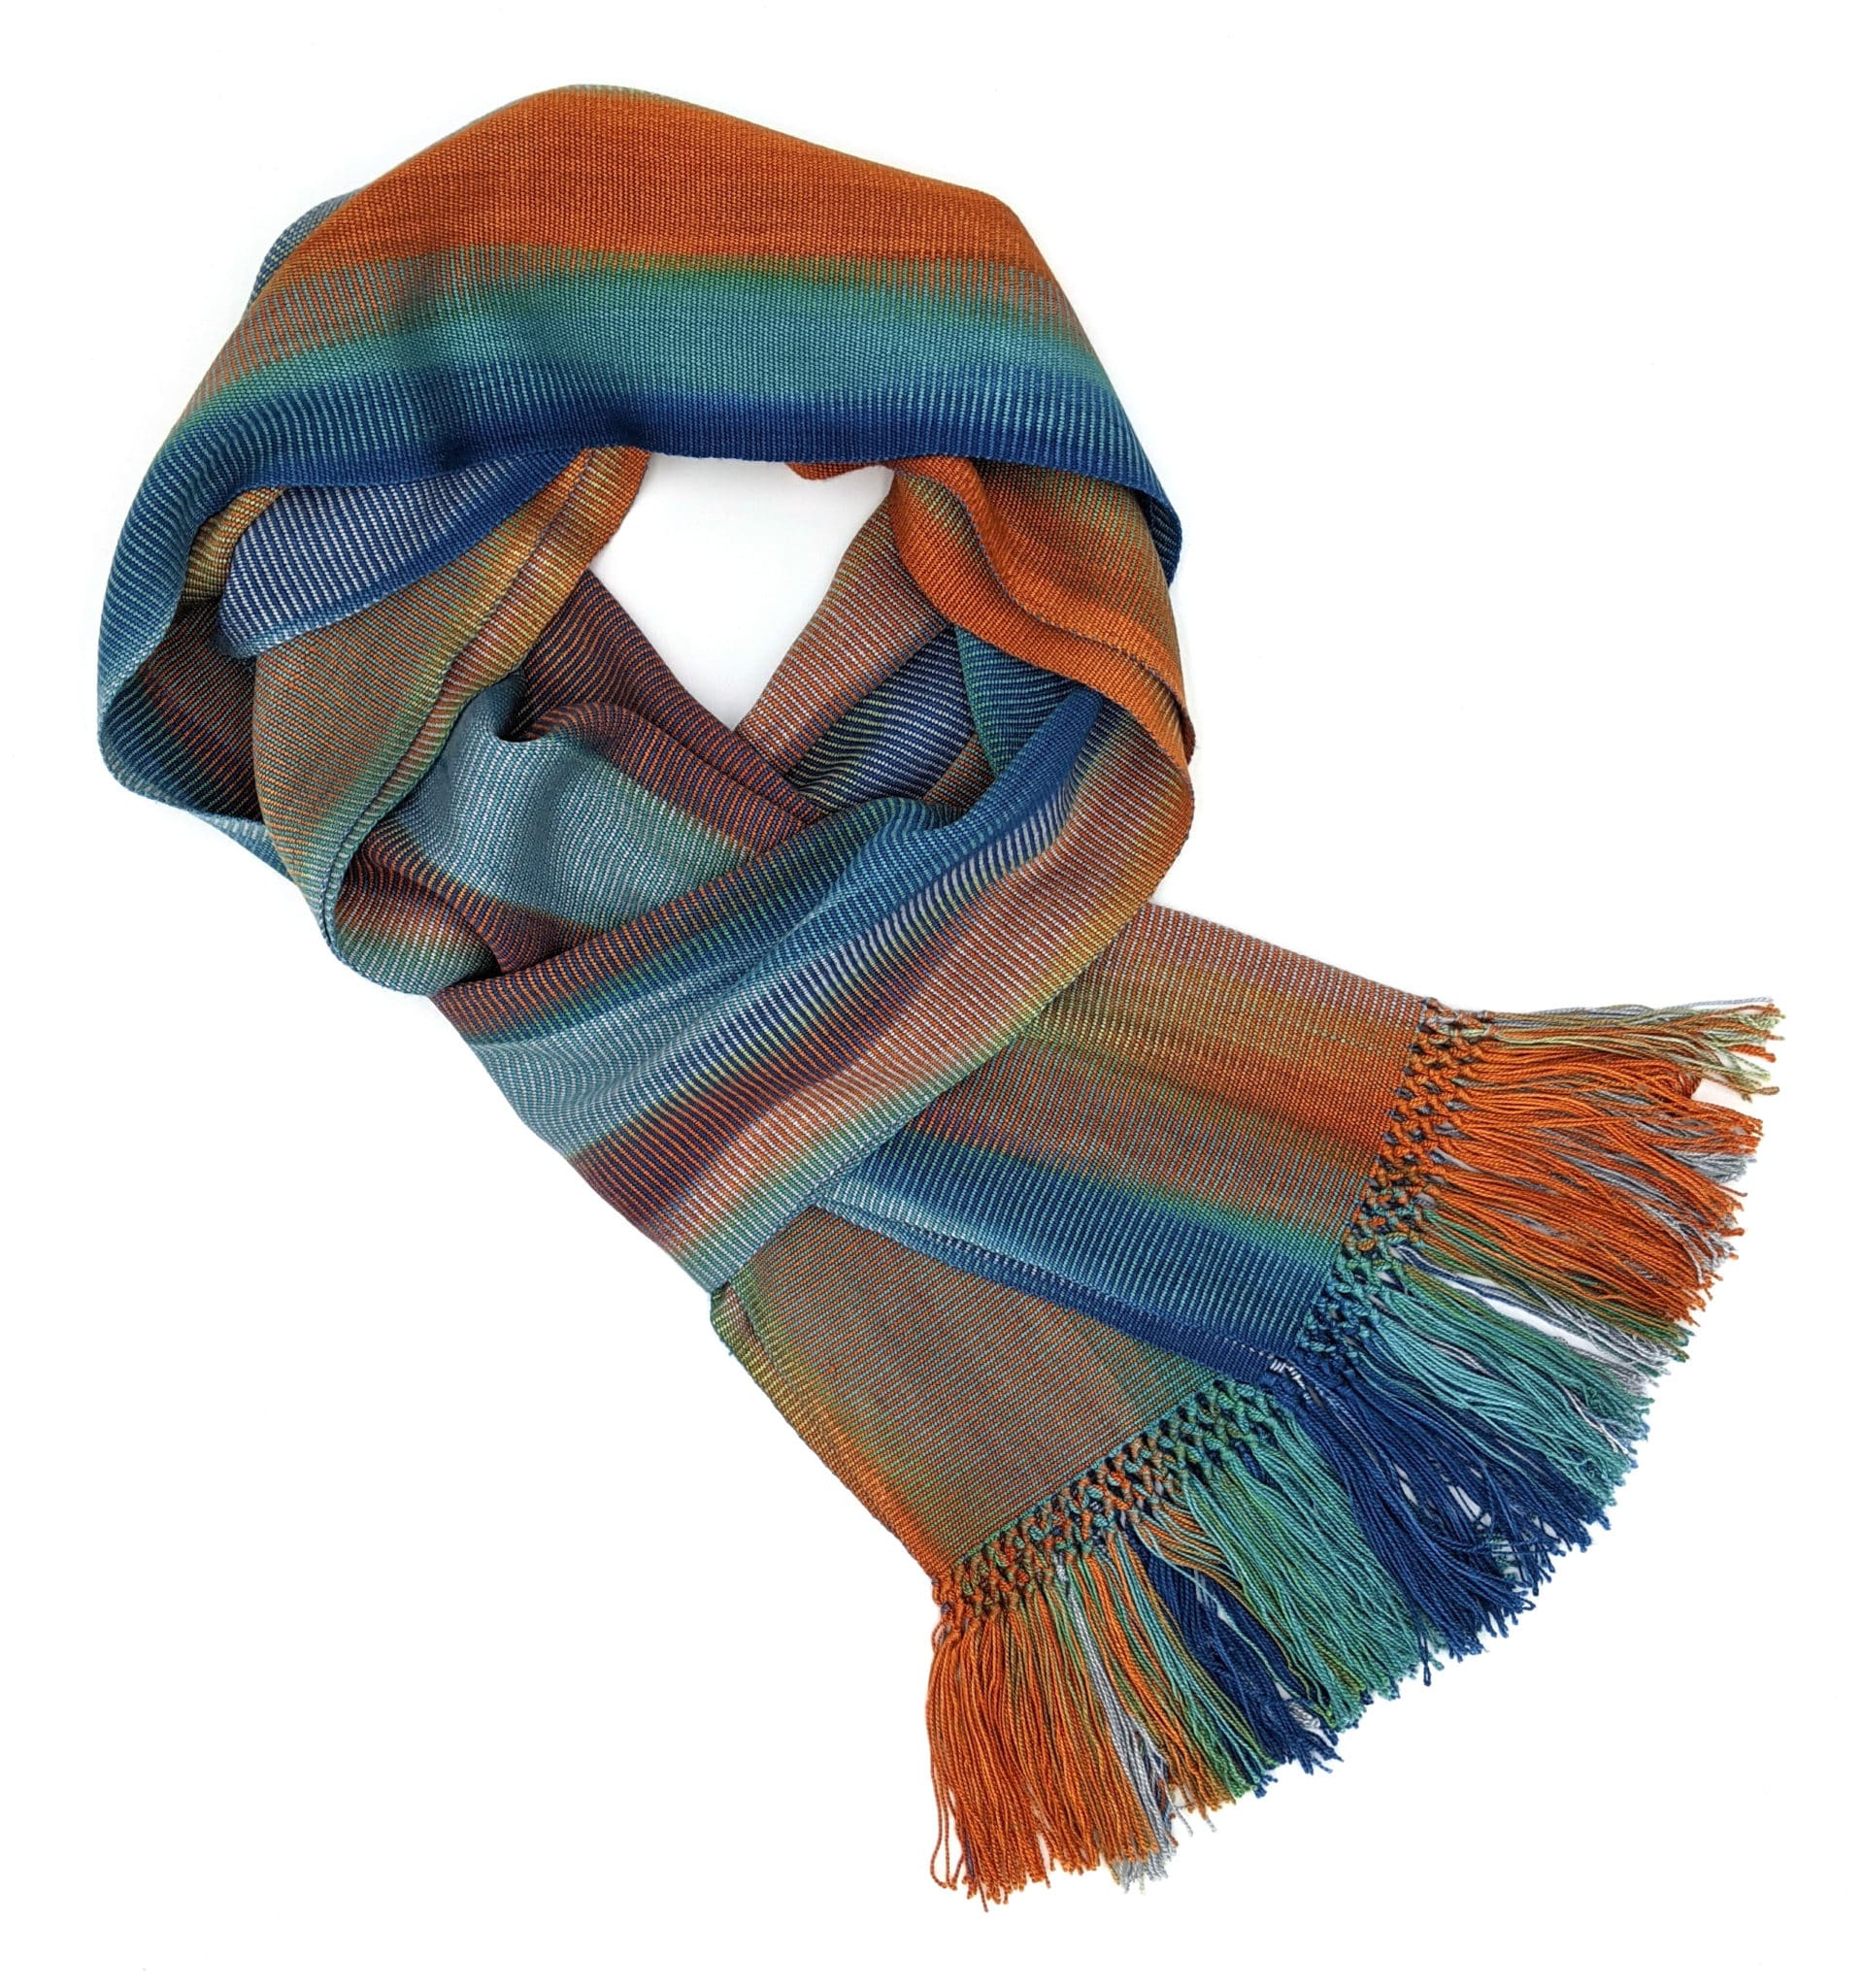 Blue, Orange, Gray - Lightweight Bamboo Handwoven Scarf 8 x 68